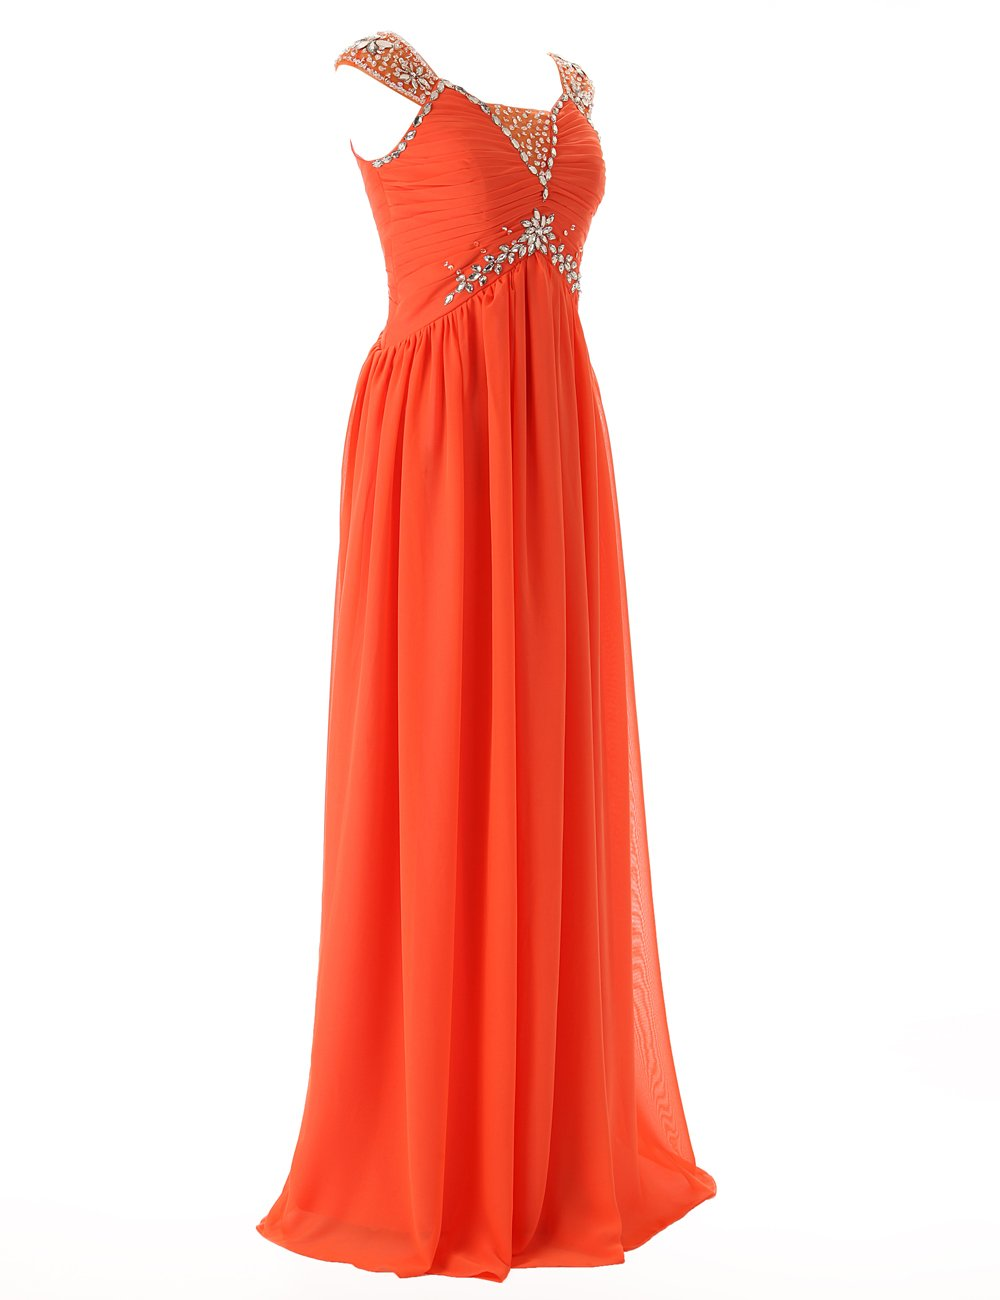 342ed539611ef 当ストアでいろいろなドレスがあり、結婚式ドレス、二次会、パーティー、演奏会、披露宴などの各種パーティーにおすすめなドレス!